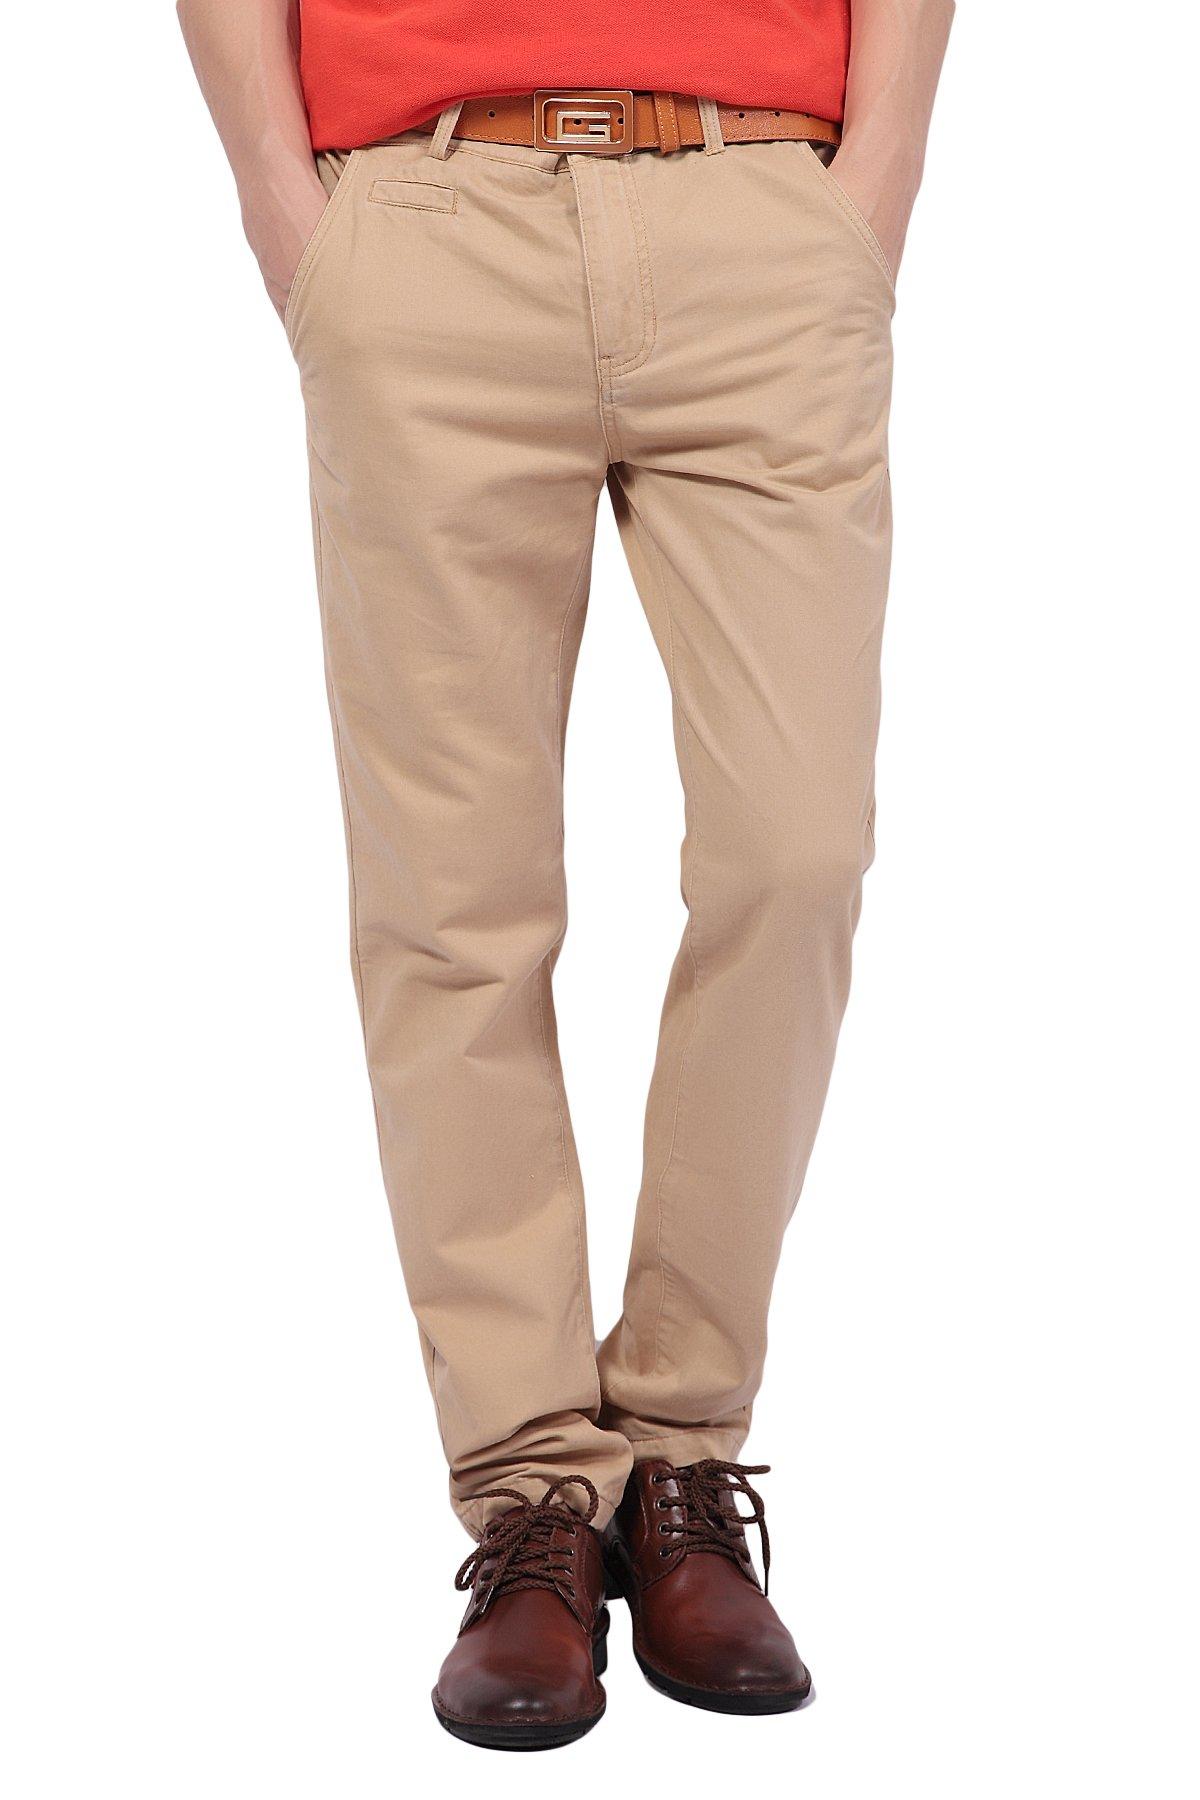 Pau1Hami1ton PH-03 Men's Chino Pants Flat-Front Casual Kaki Twill Slim-Fit Straight Leg(28, Khaki)